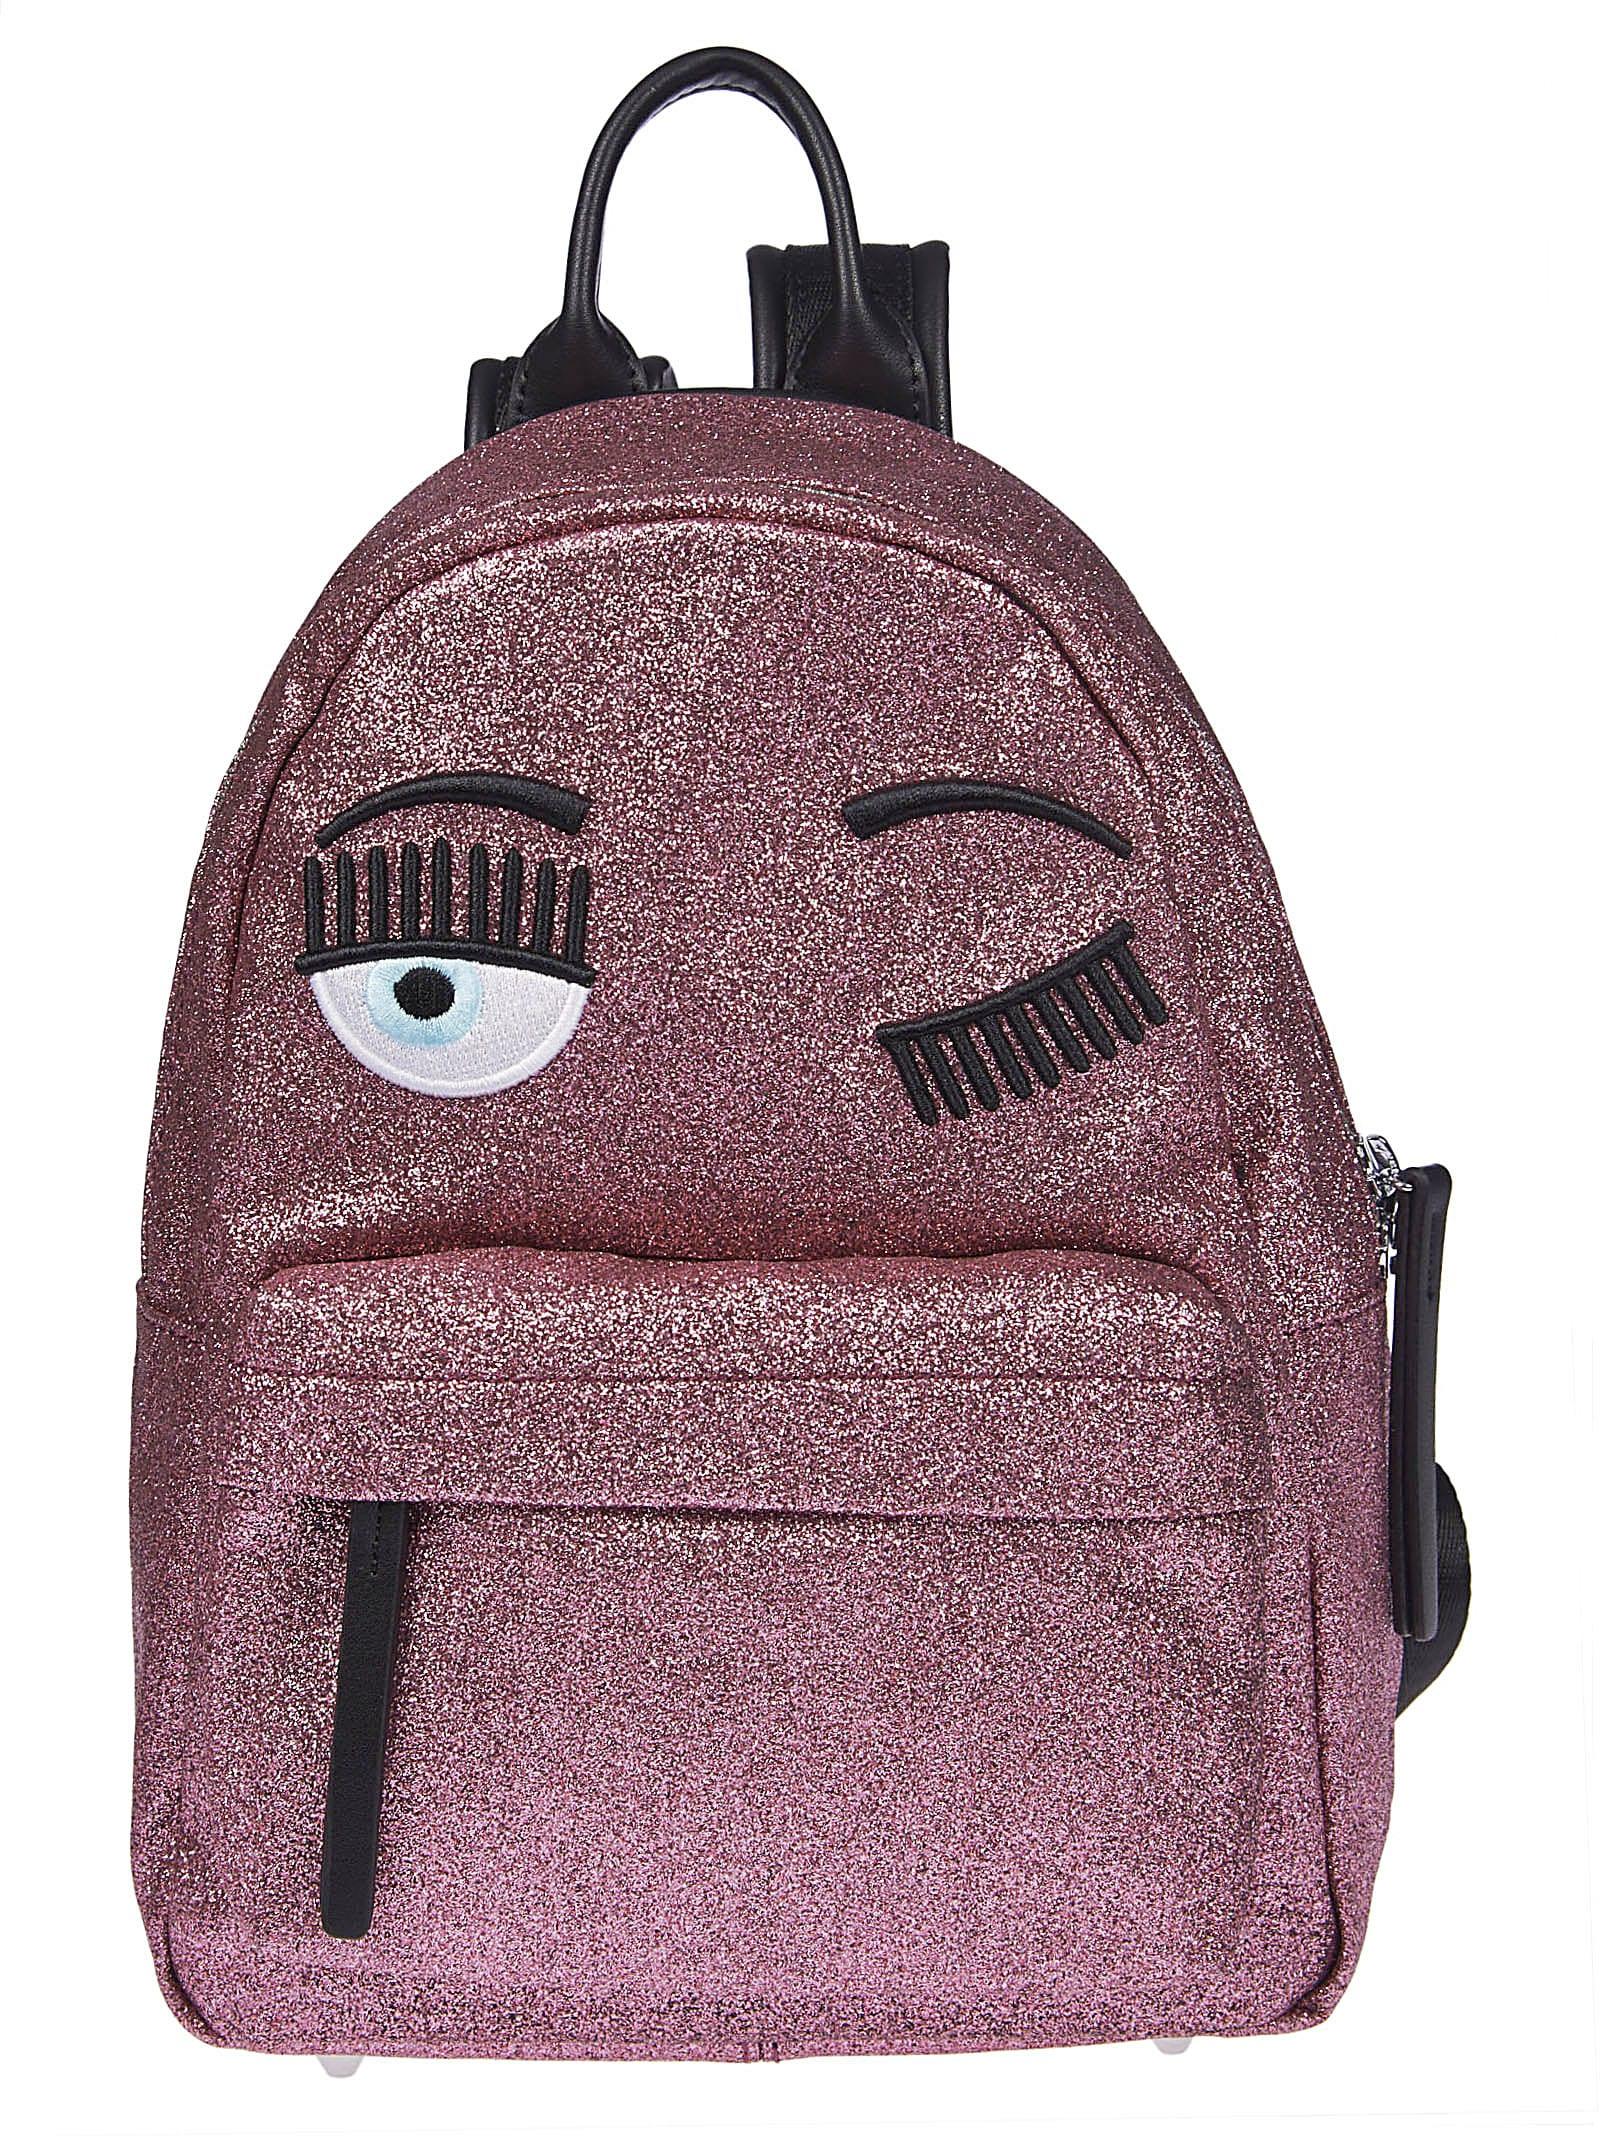 Chiara Ferragni Backpacks FLIRTING SMALL BACKPACK